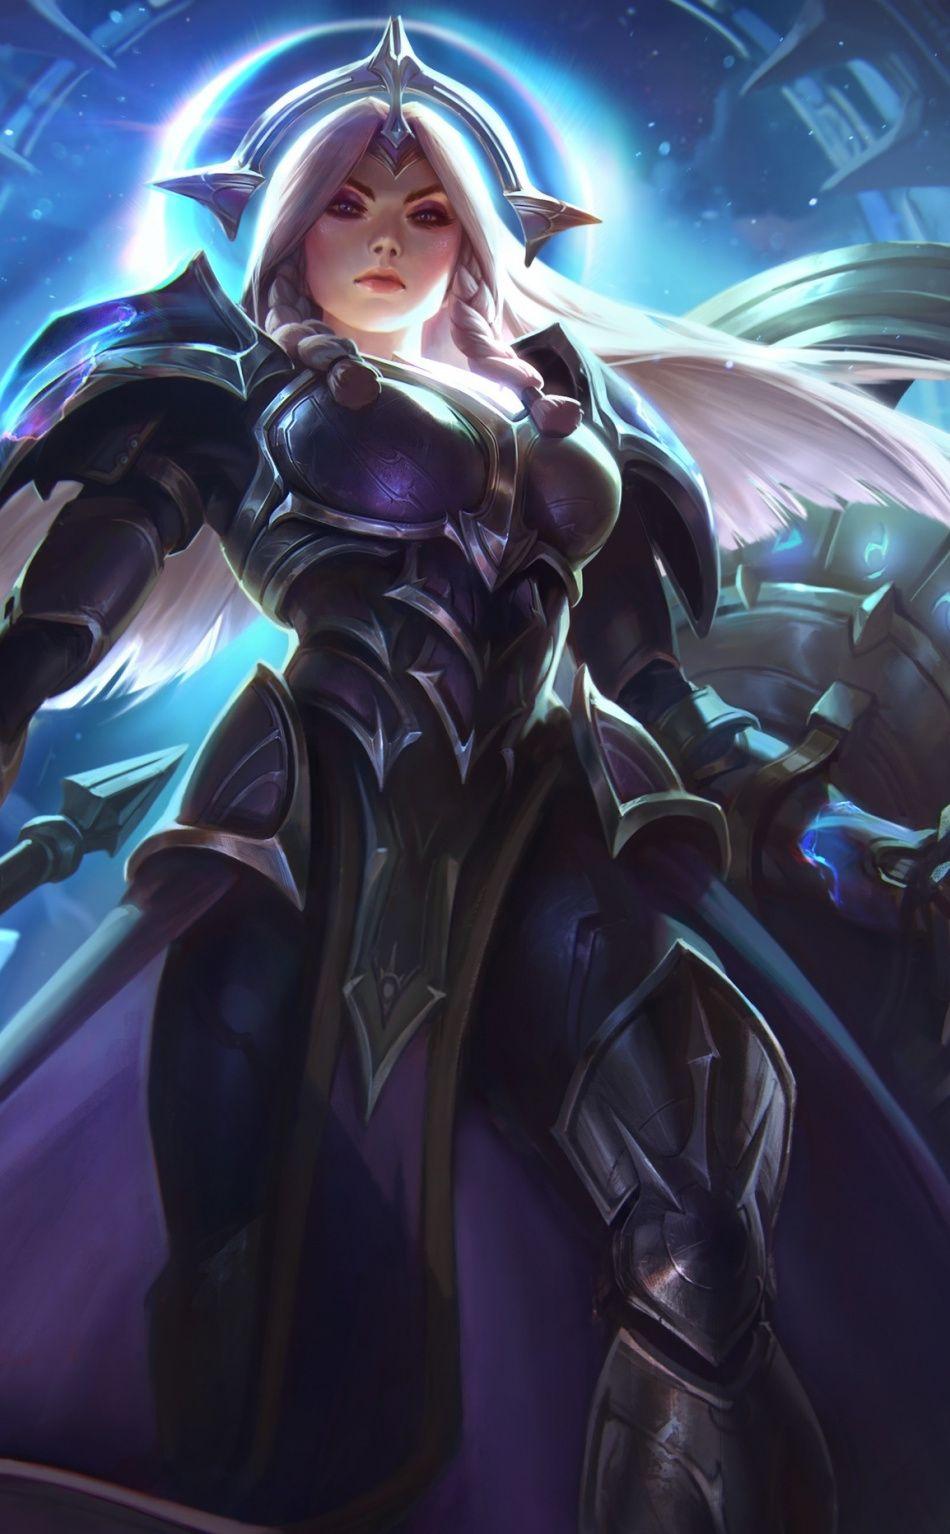 Hot Leona Online Game League Of Legends 950x1534 Wallpaper